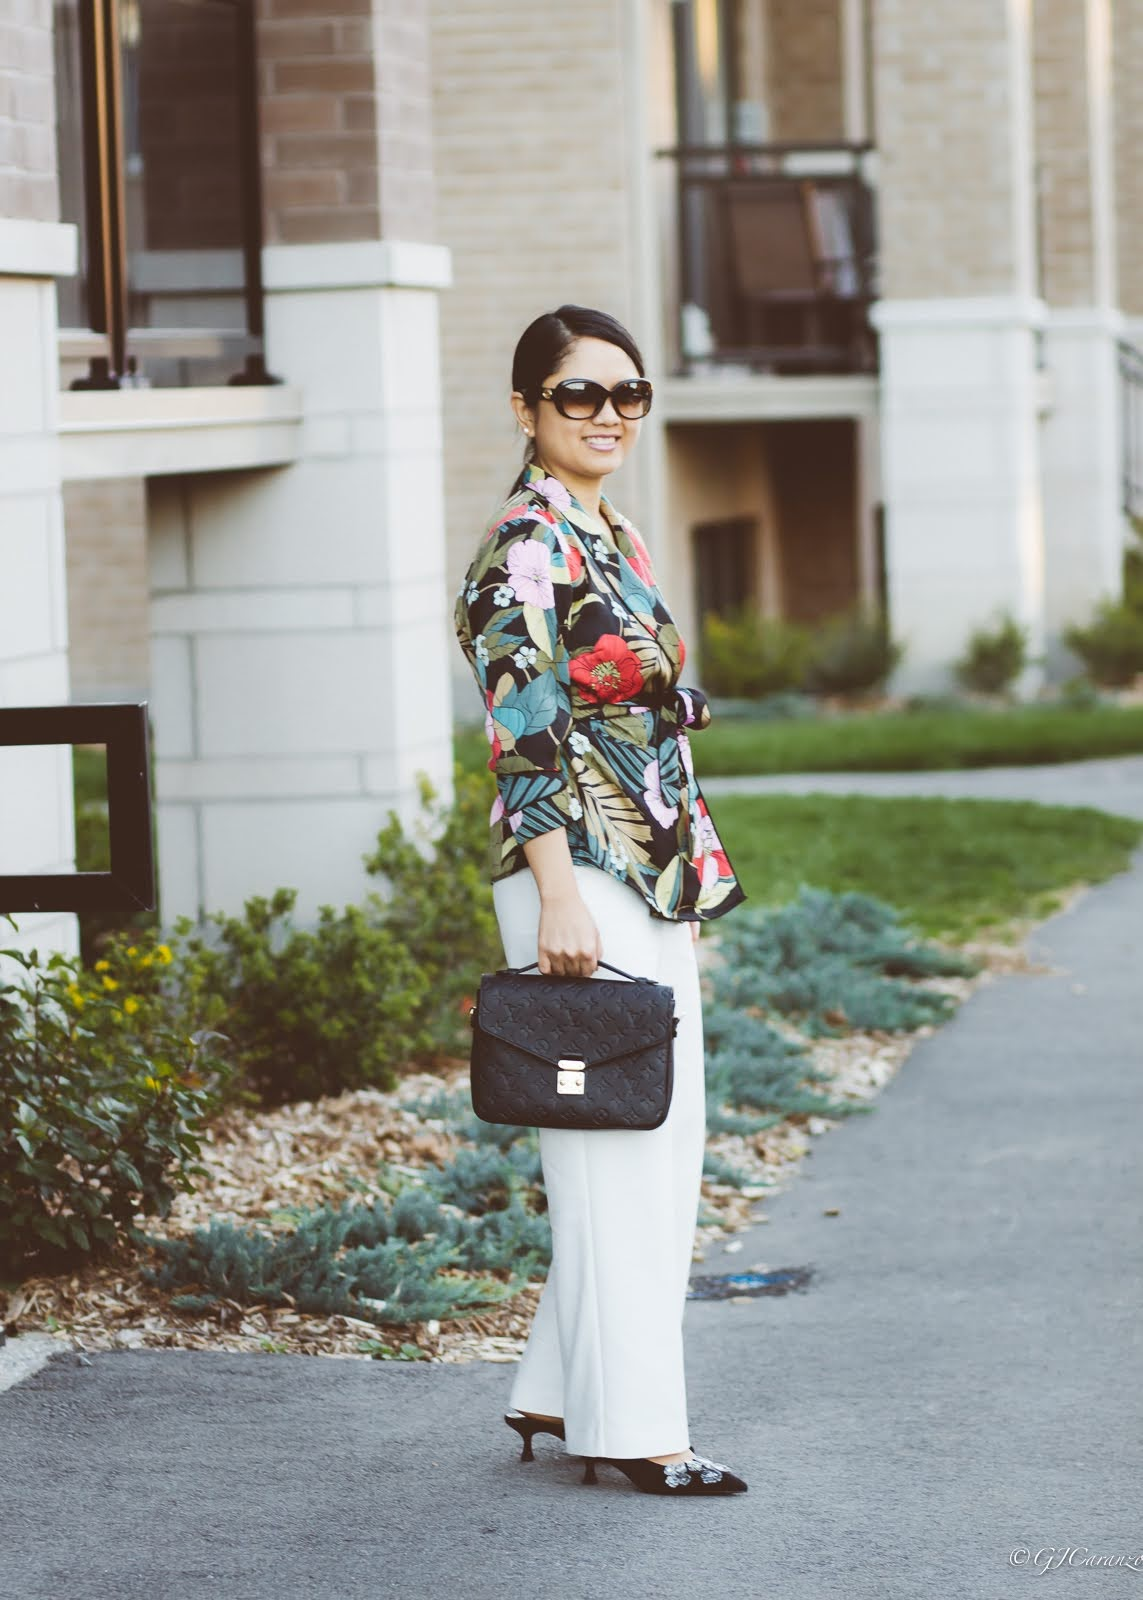 Guess Wrap Blouse   Zara Wide Leg Pants   Louis Vuitton Pochette Metis in Black Empreinte Leather   Coach Mules   Gucci Sunglasses   Petite Outfit   Mom Style